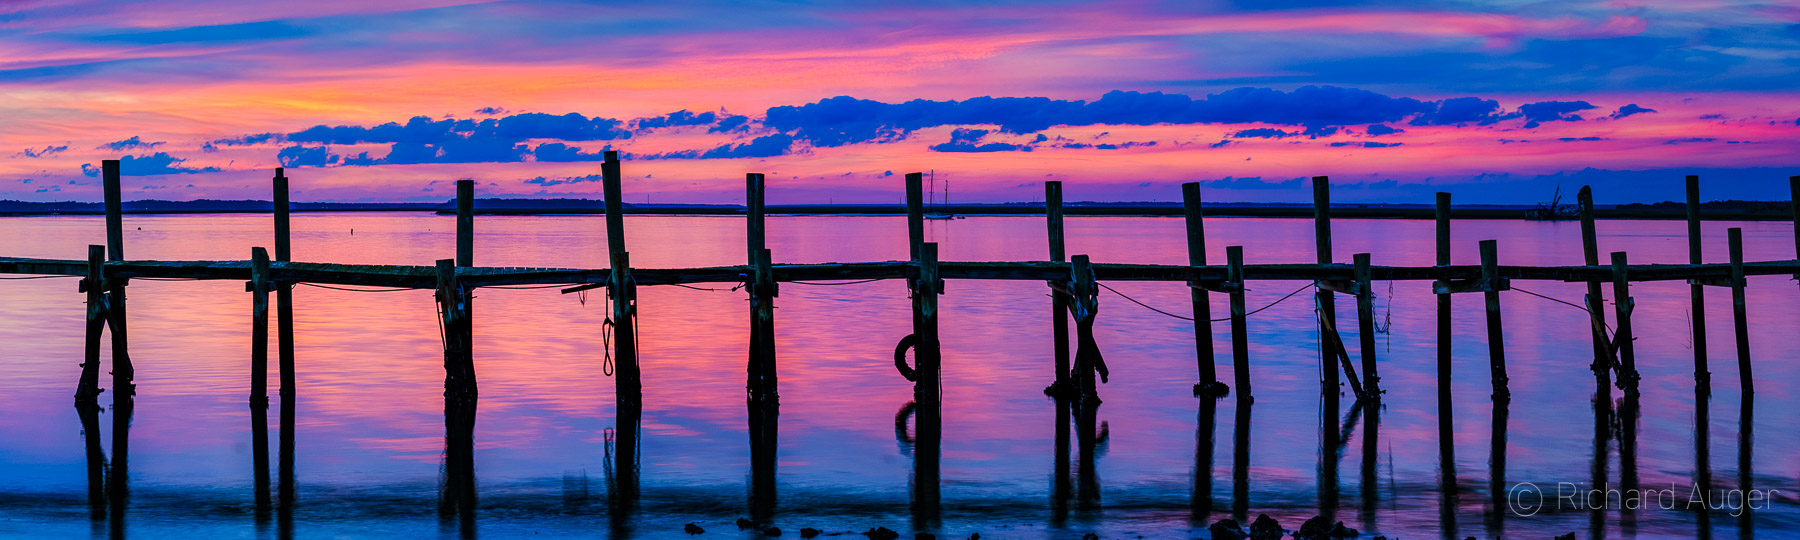 Cumberland Sound, Fernandina Beach, Amelia Island, Florida, Dock, Sunset, Panorama